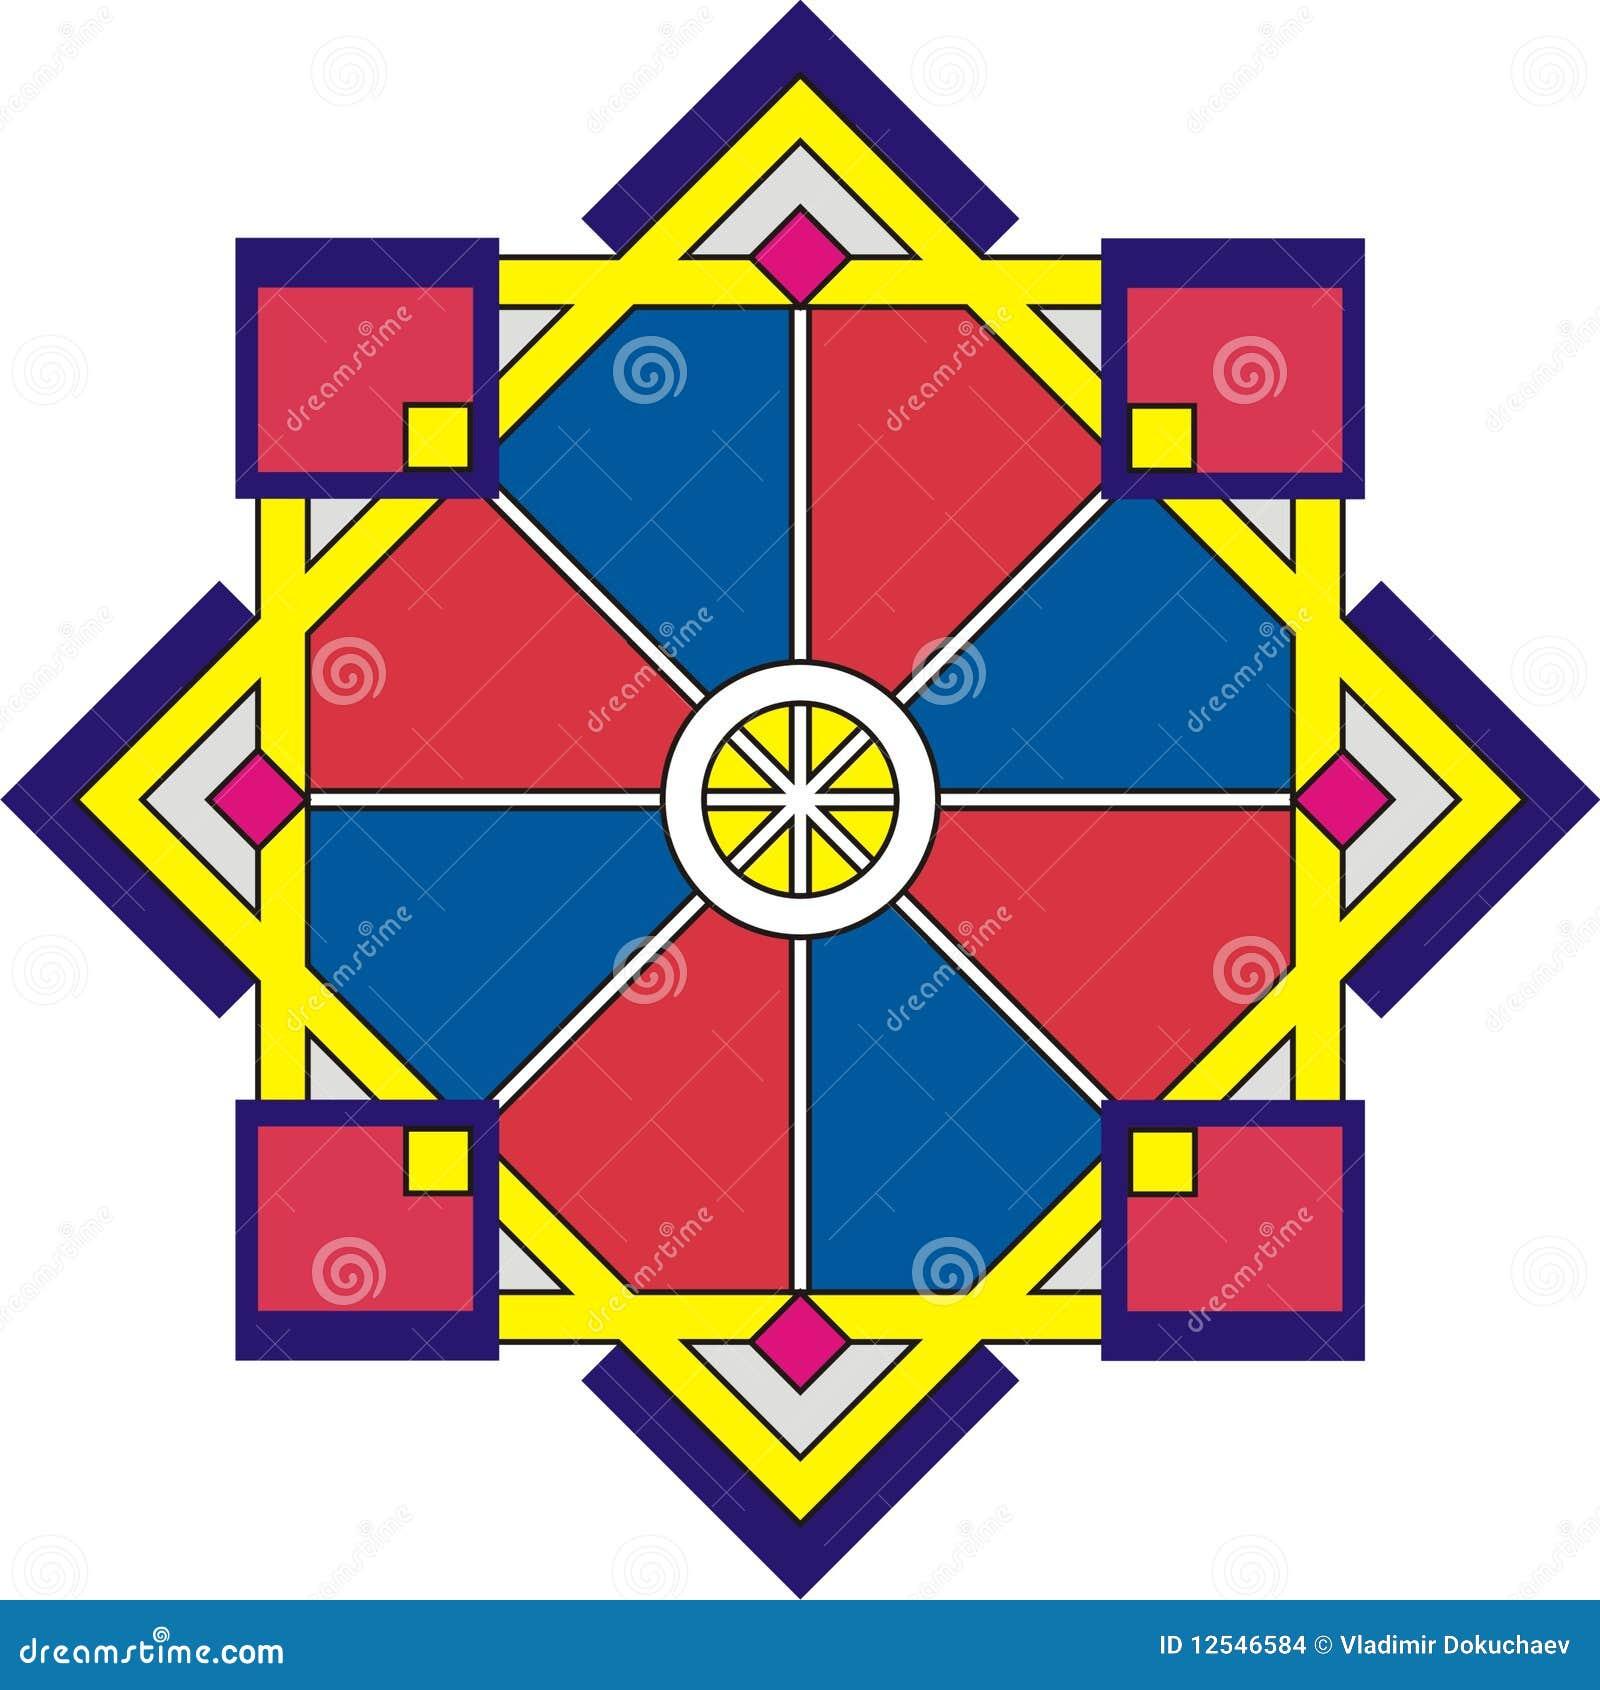 La geometria - rosetta ornamentale